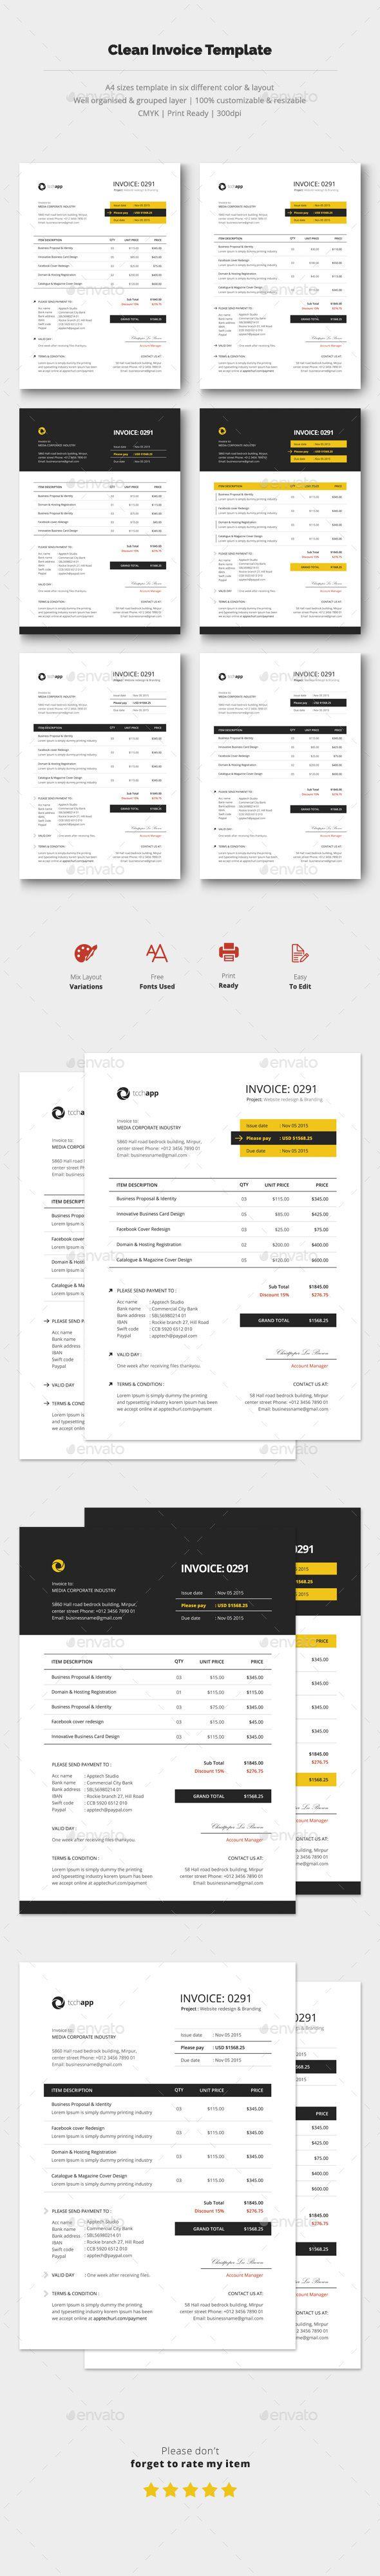 Clean Invoice Template PSD #design Download: http://graphicriver.net/item/clean-invoice-template-vol3/14297178?ref=ksioks